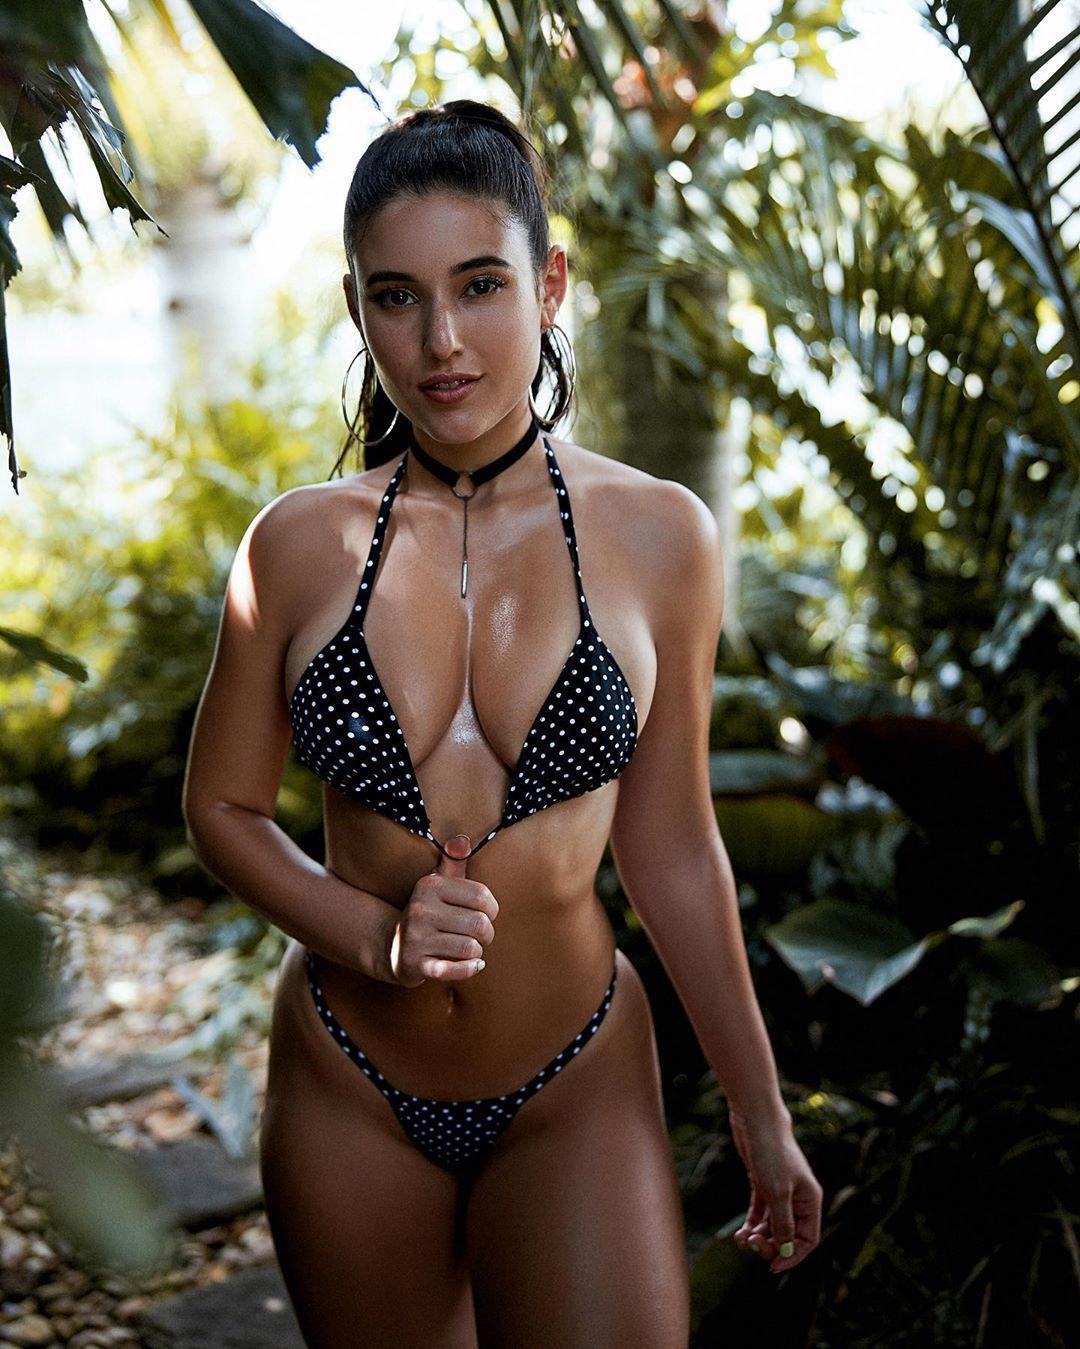 Angie Varona Bikini Onlyfans Set Leaked Pjejlh